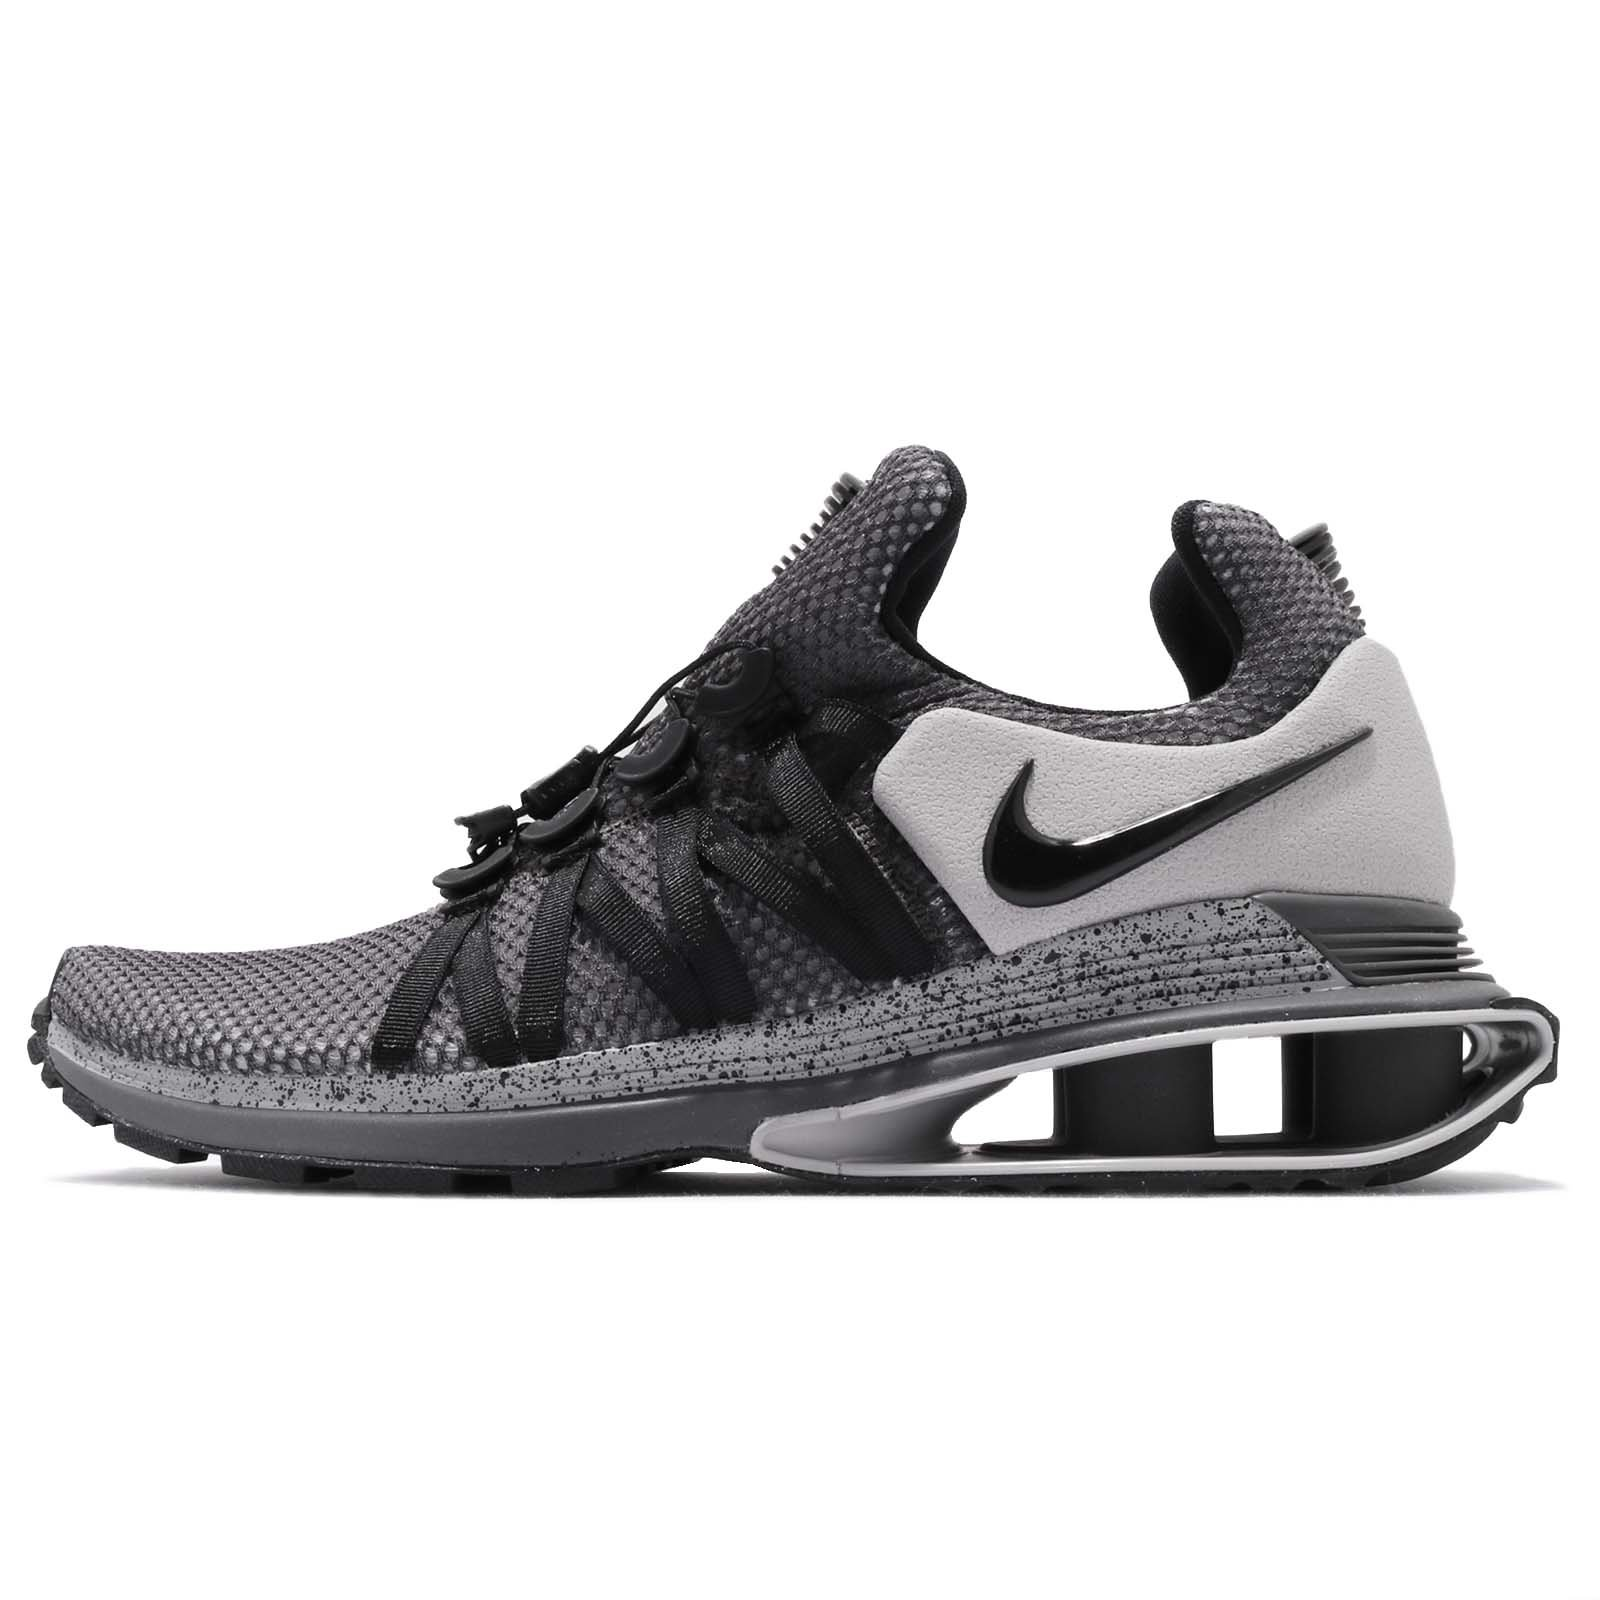 d10139641ff Galleon - Nike Men s Shox Gravity Running Shoes-Atmosphere Grey Black-8.5